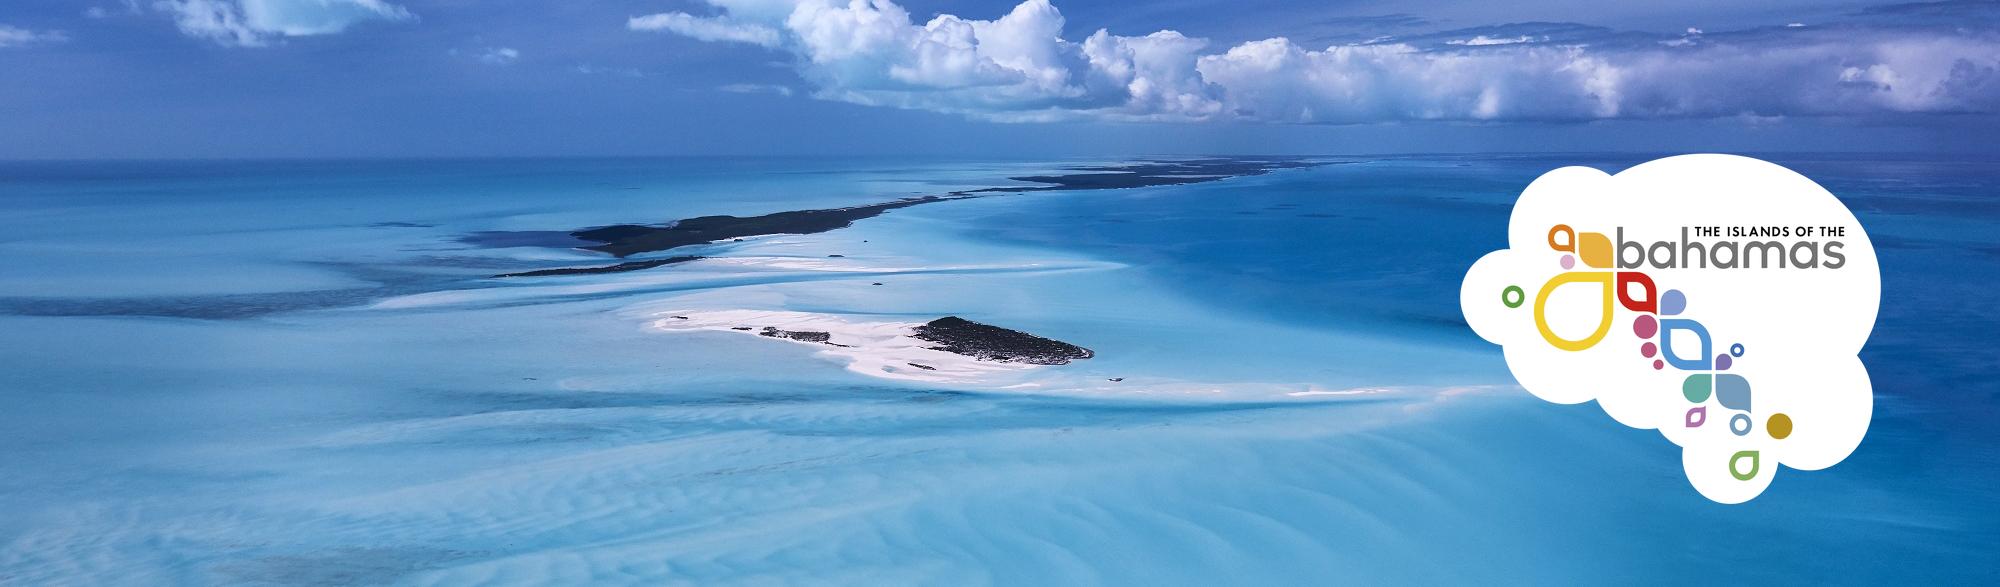 BahamasBlog.de